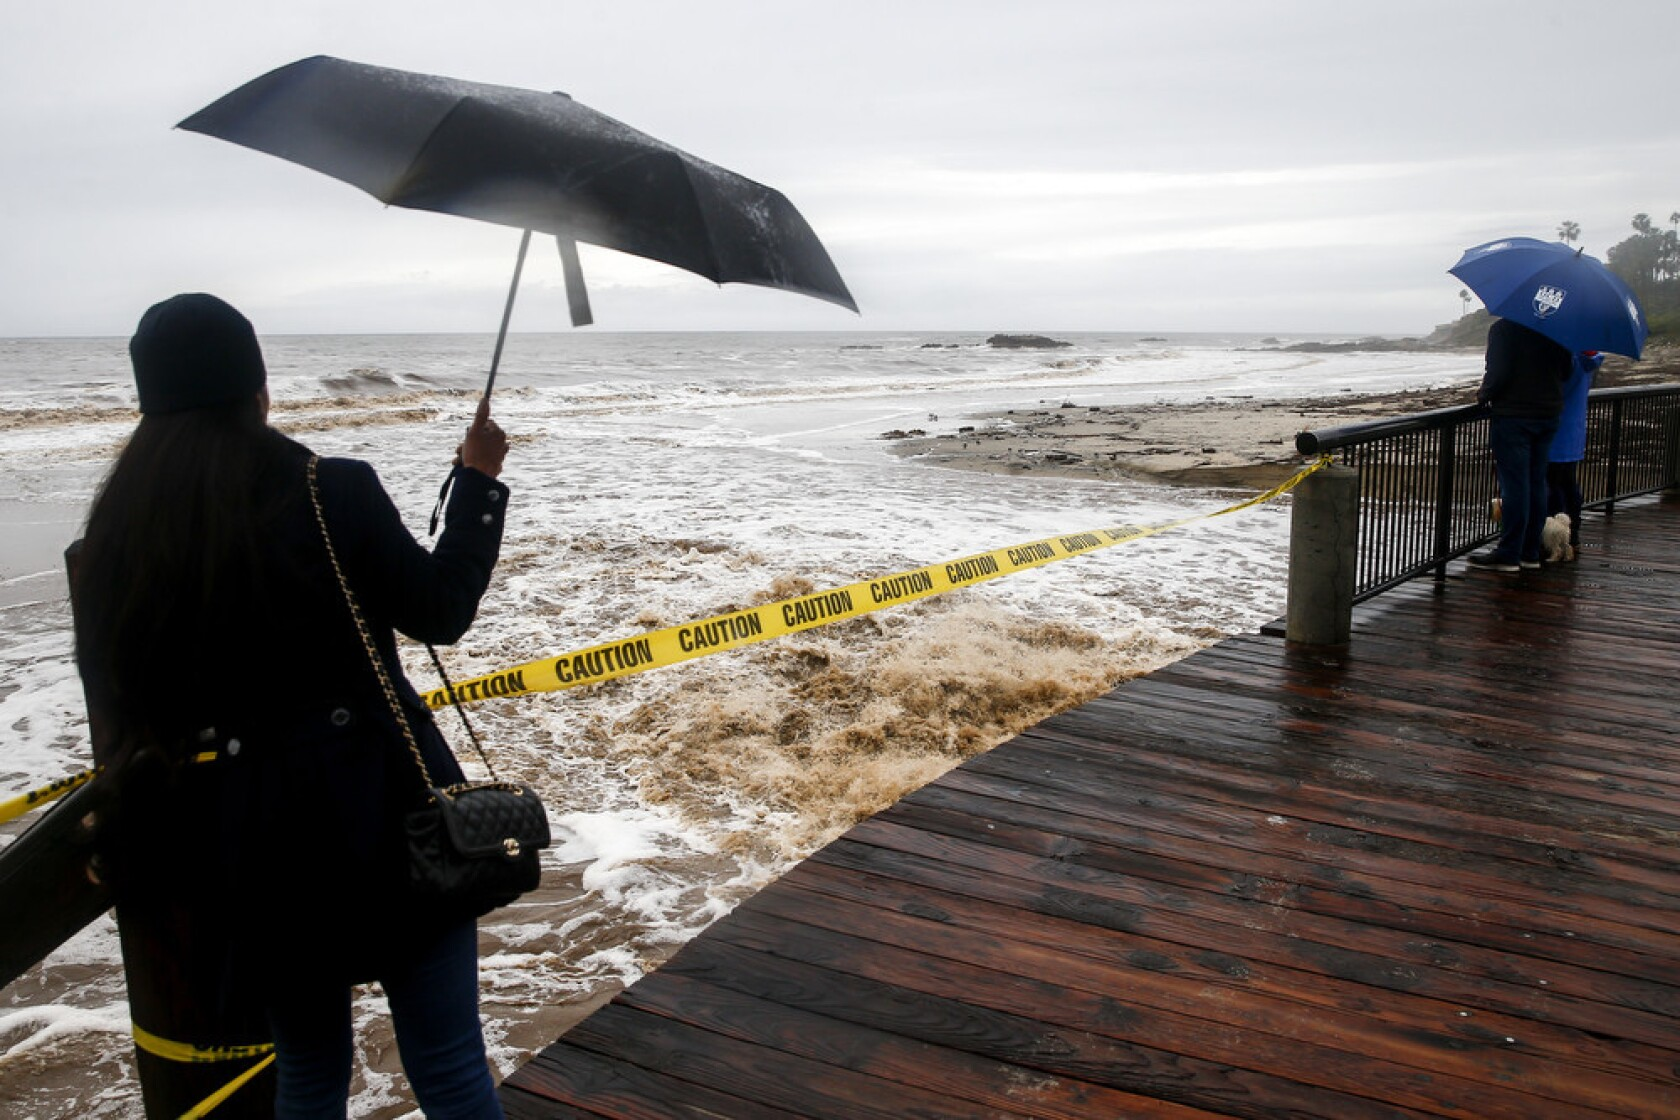 Monster storm pummels California, prompting evacuations amid